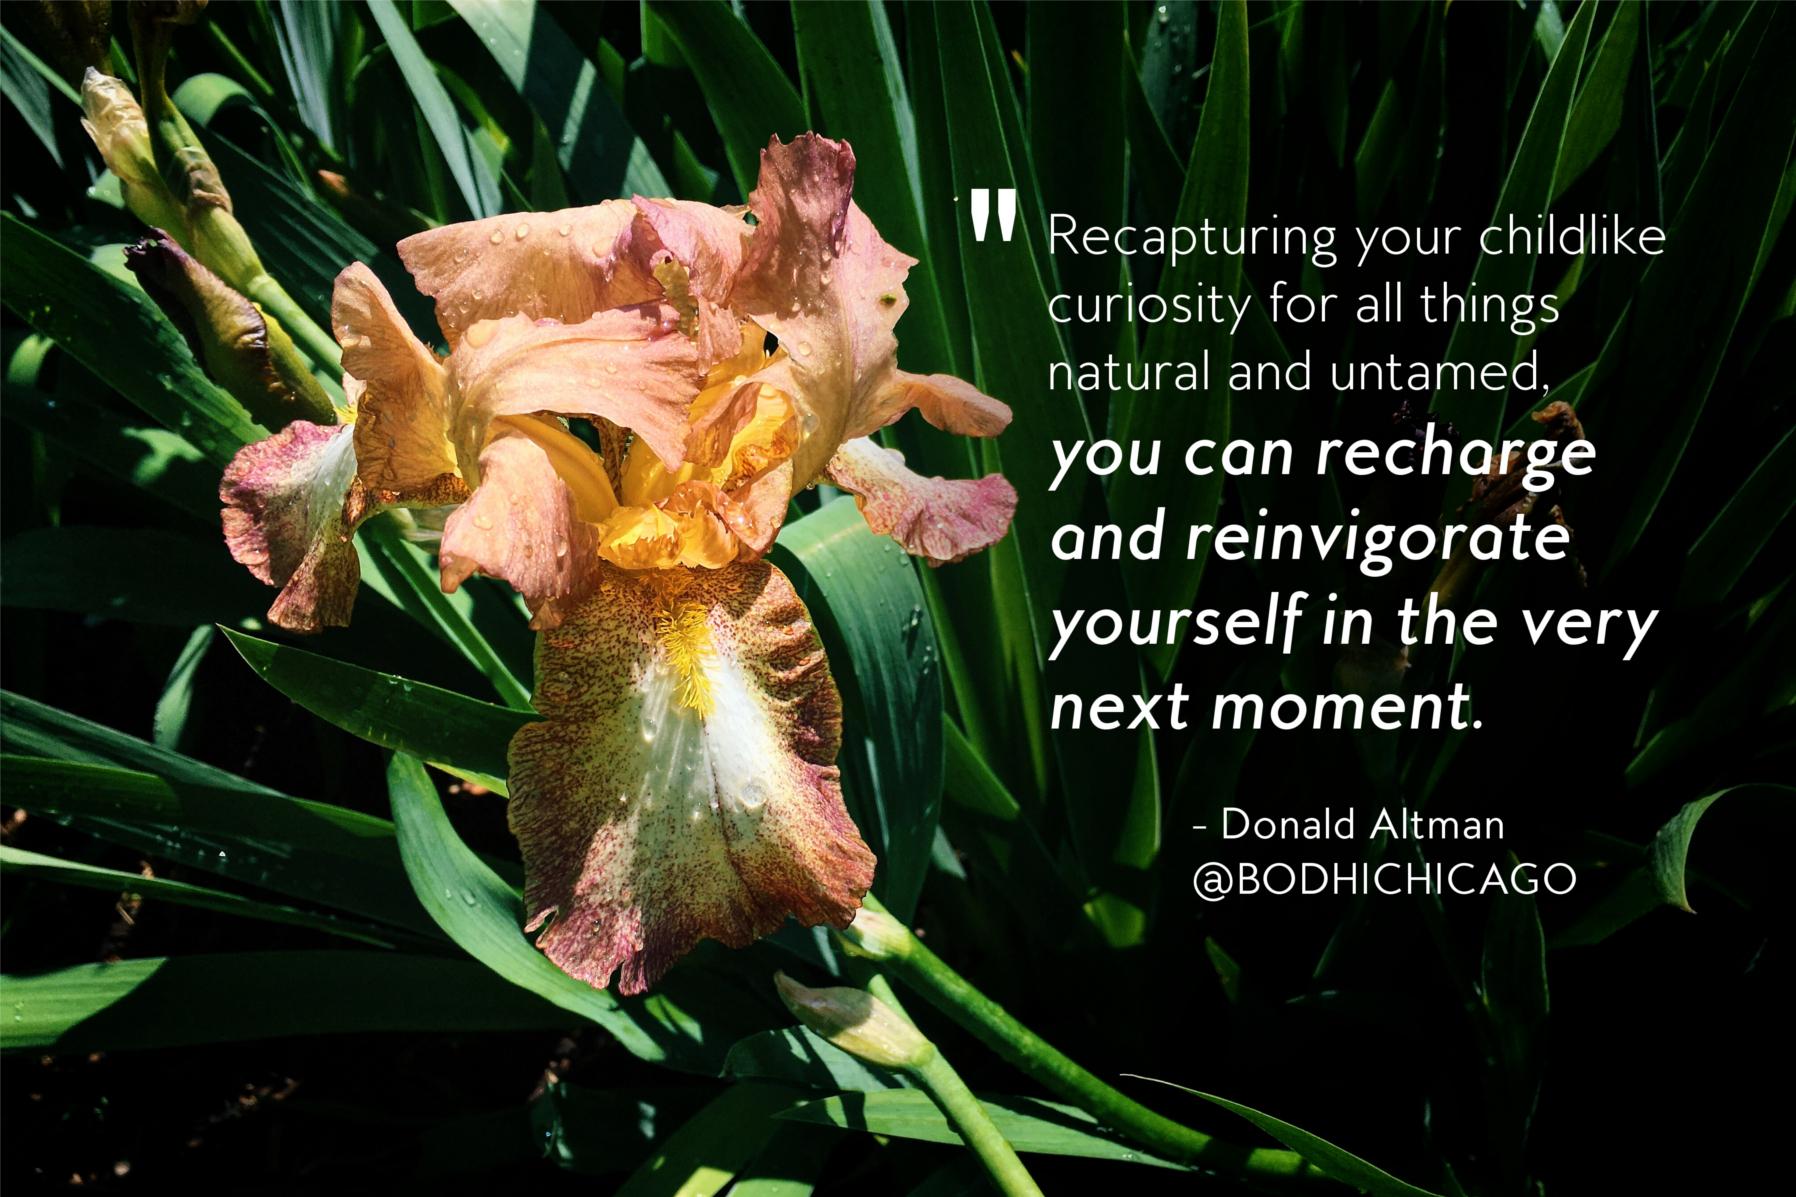 Wednesday Wisdom Quote: Donald Altman On Recharging And Reinvigorating